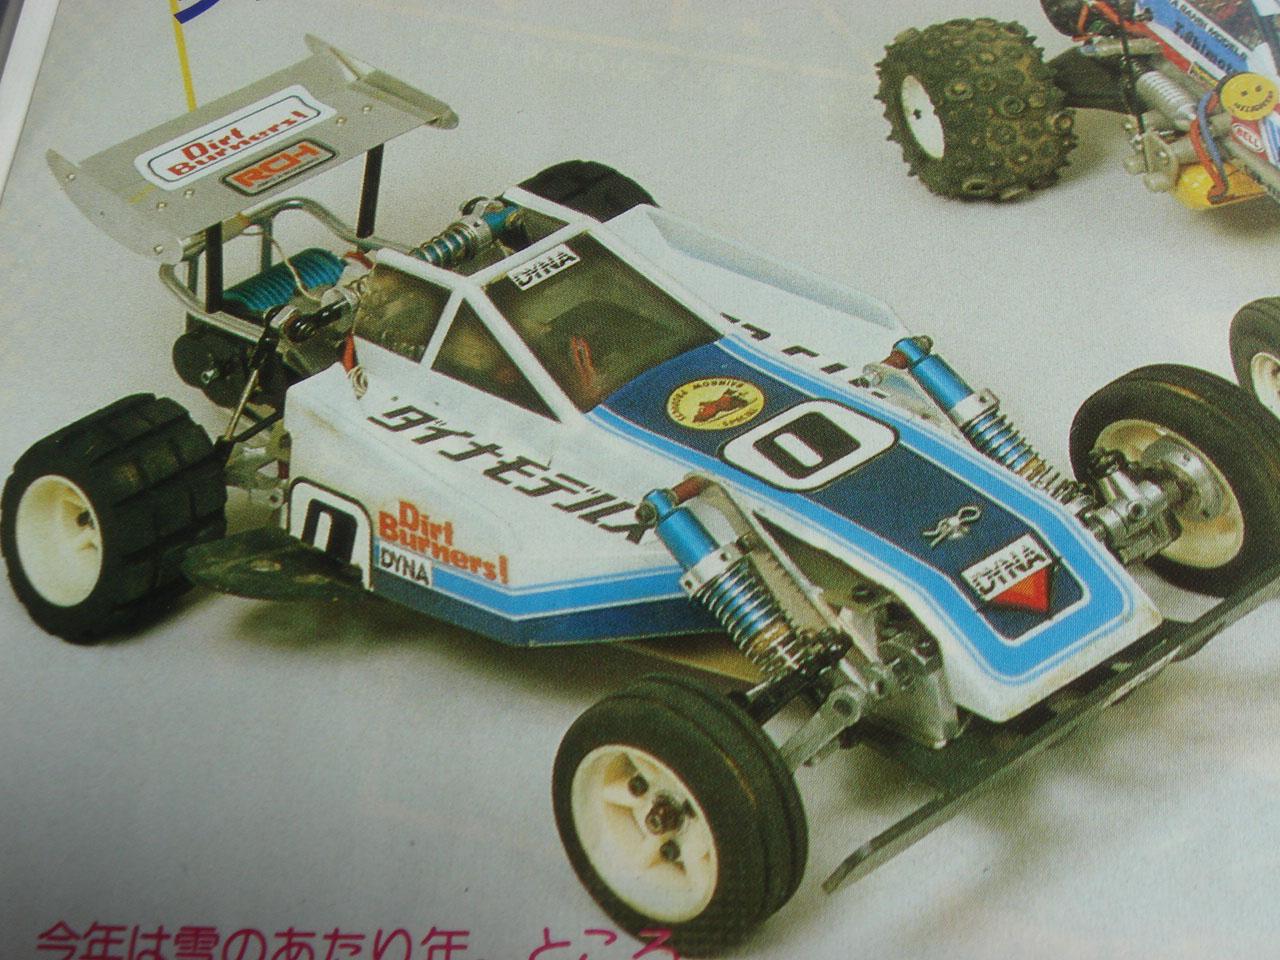 FIBERGLASS BRACKET  Rear Chassis Support Kyosho Tomahawk VW Beetle Team CRP 1024